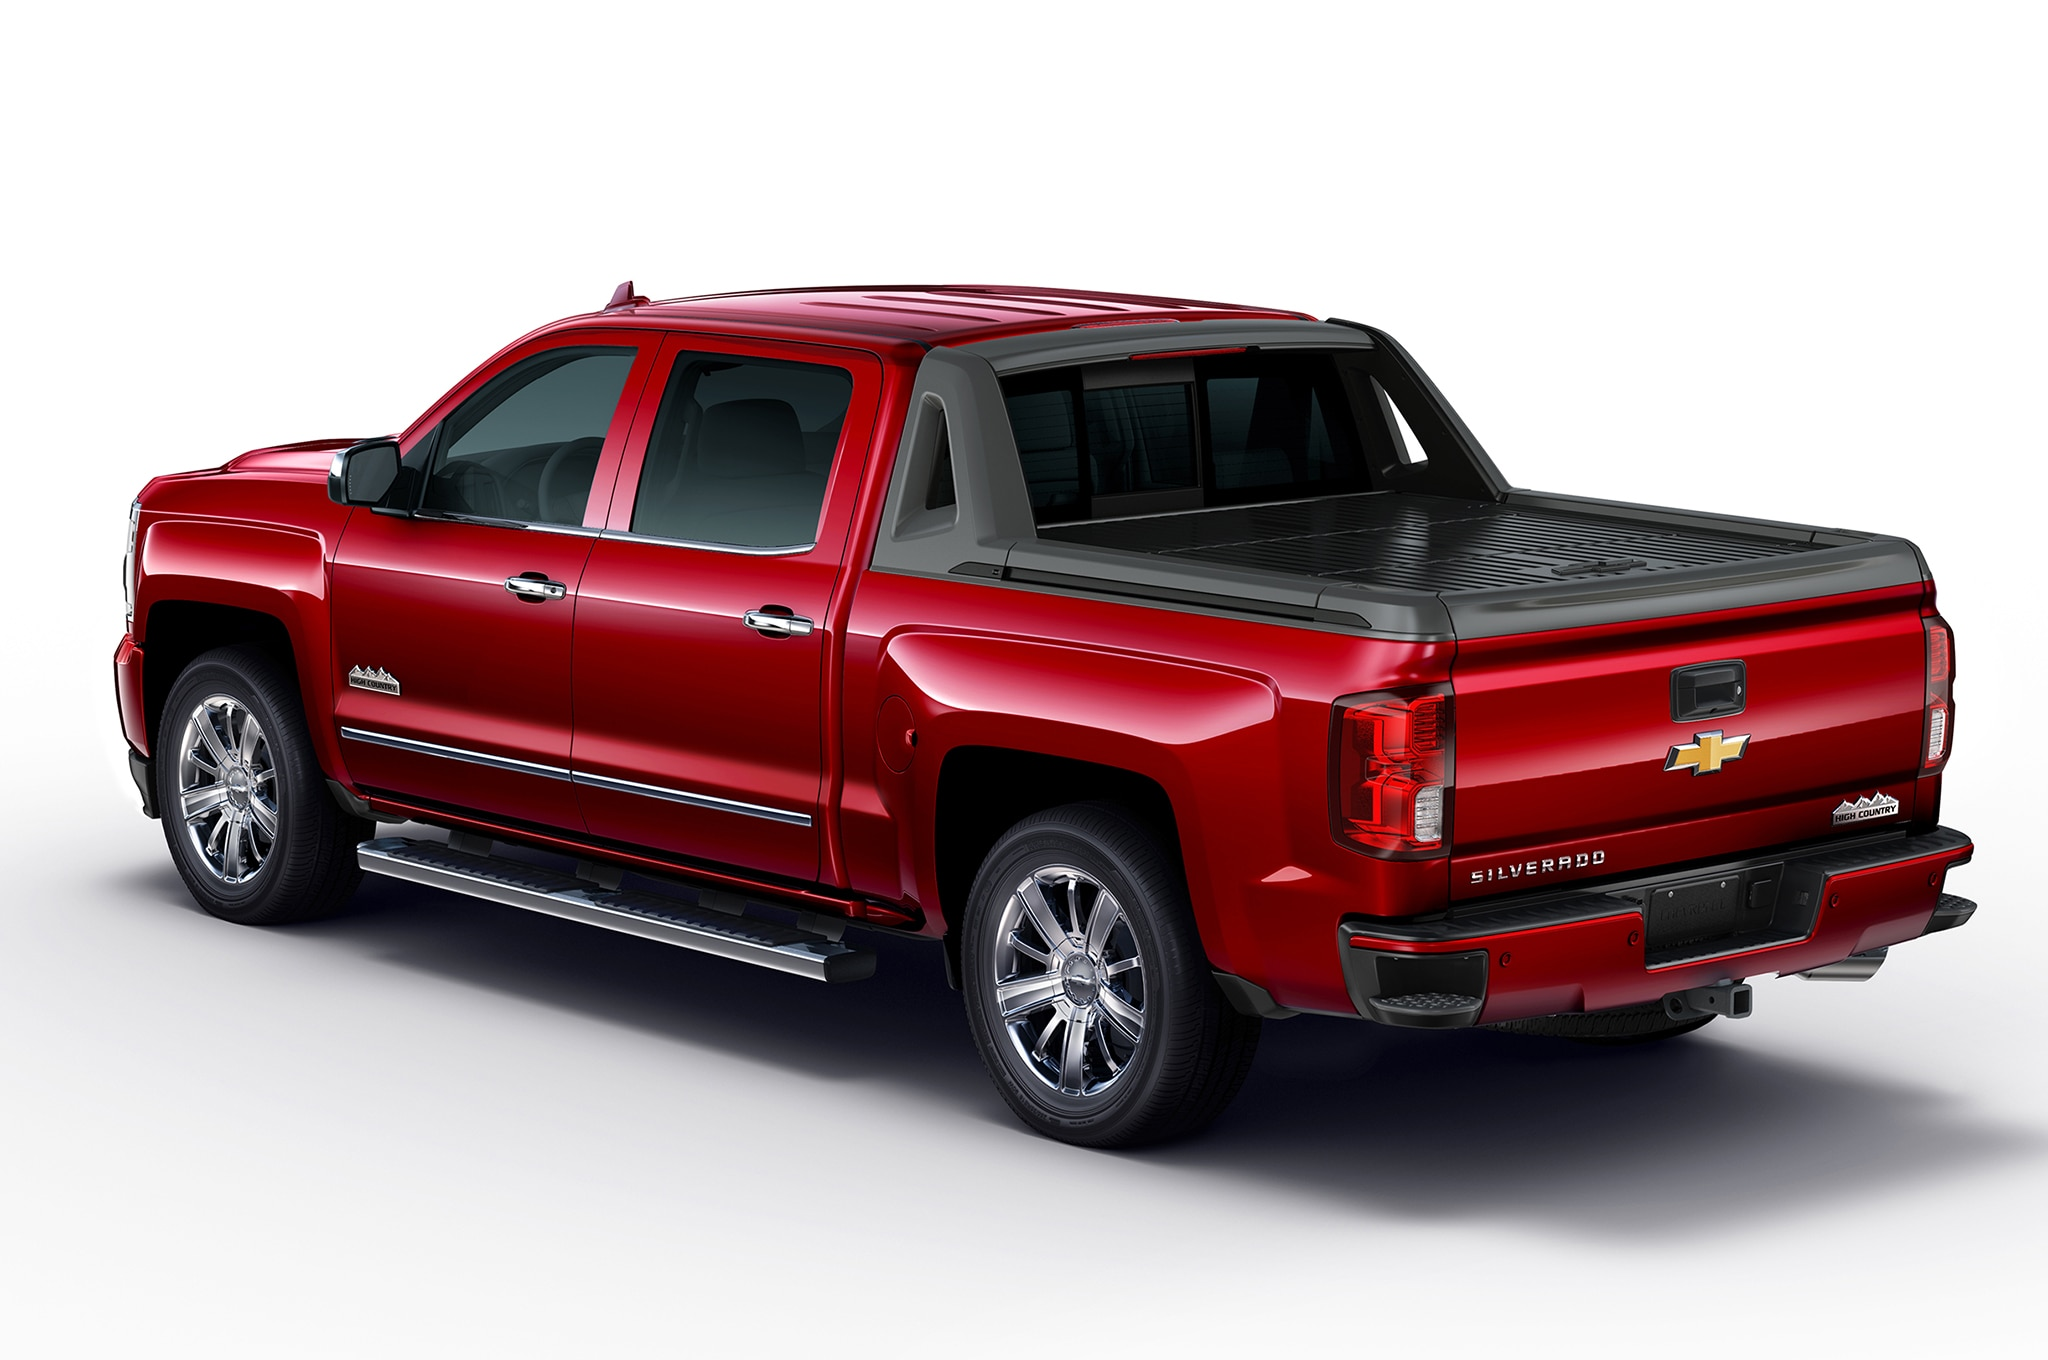 Chevrolet Silverado High Desert Package Arriving this Fall